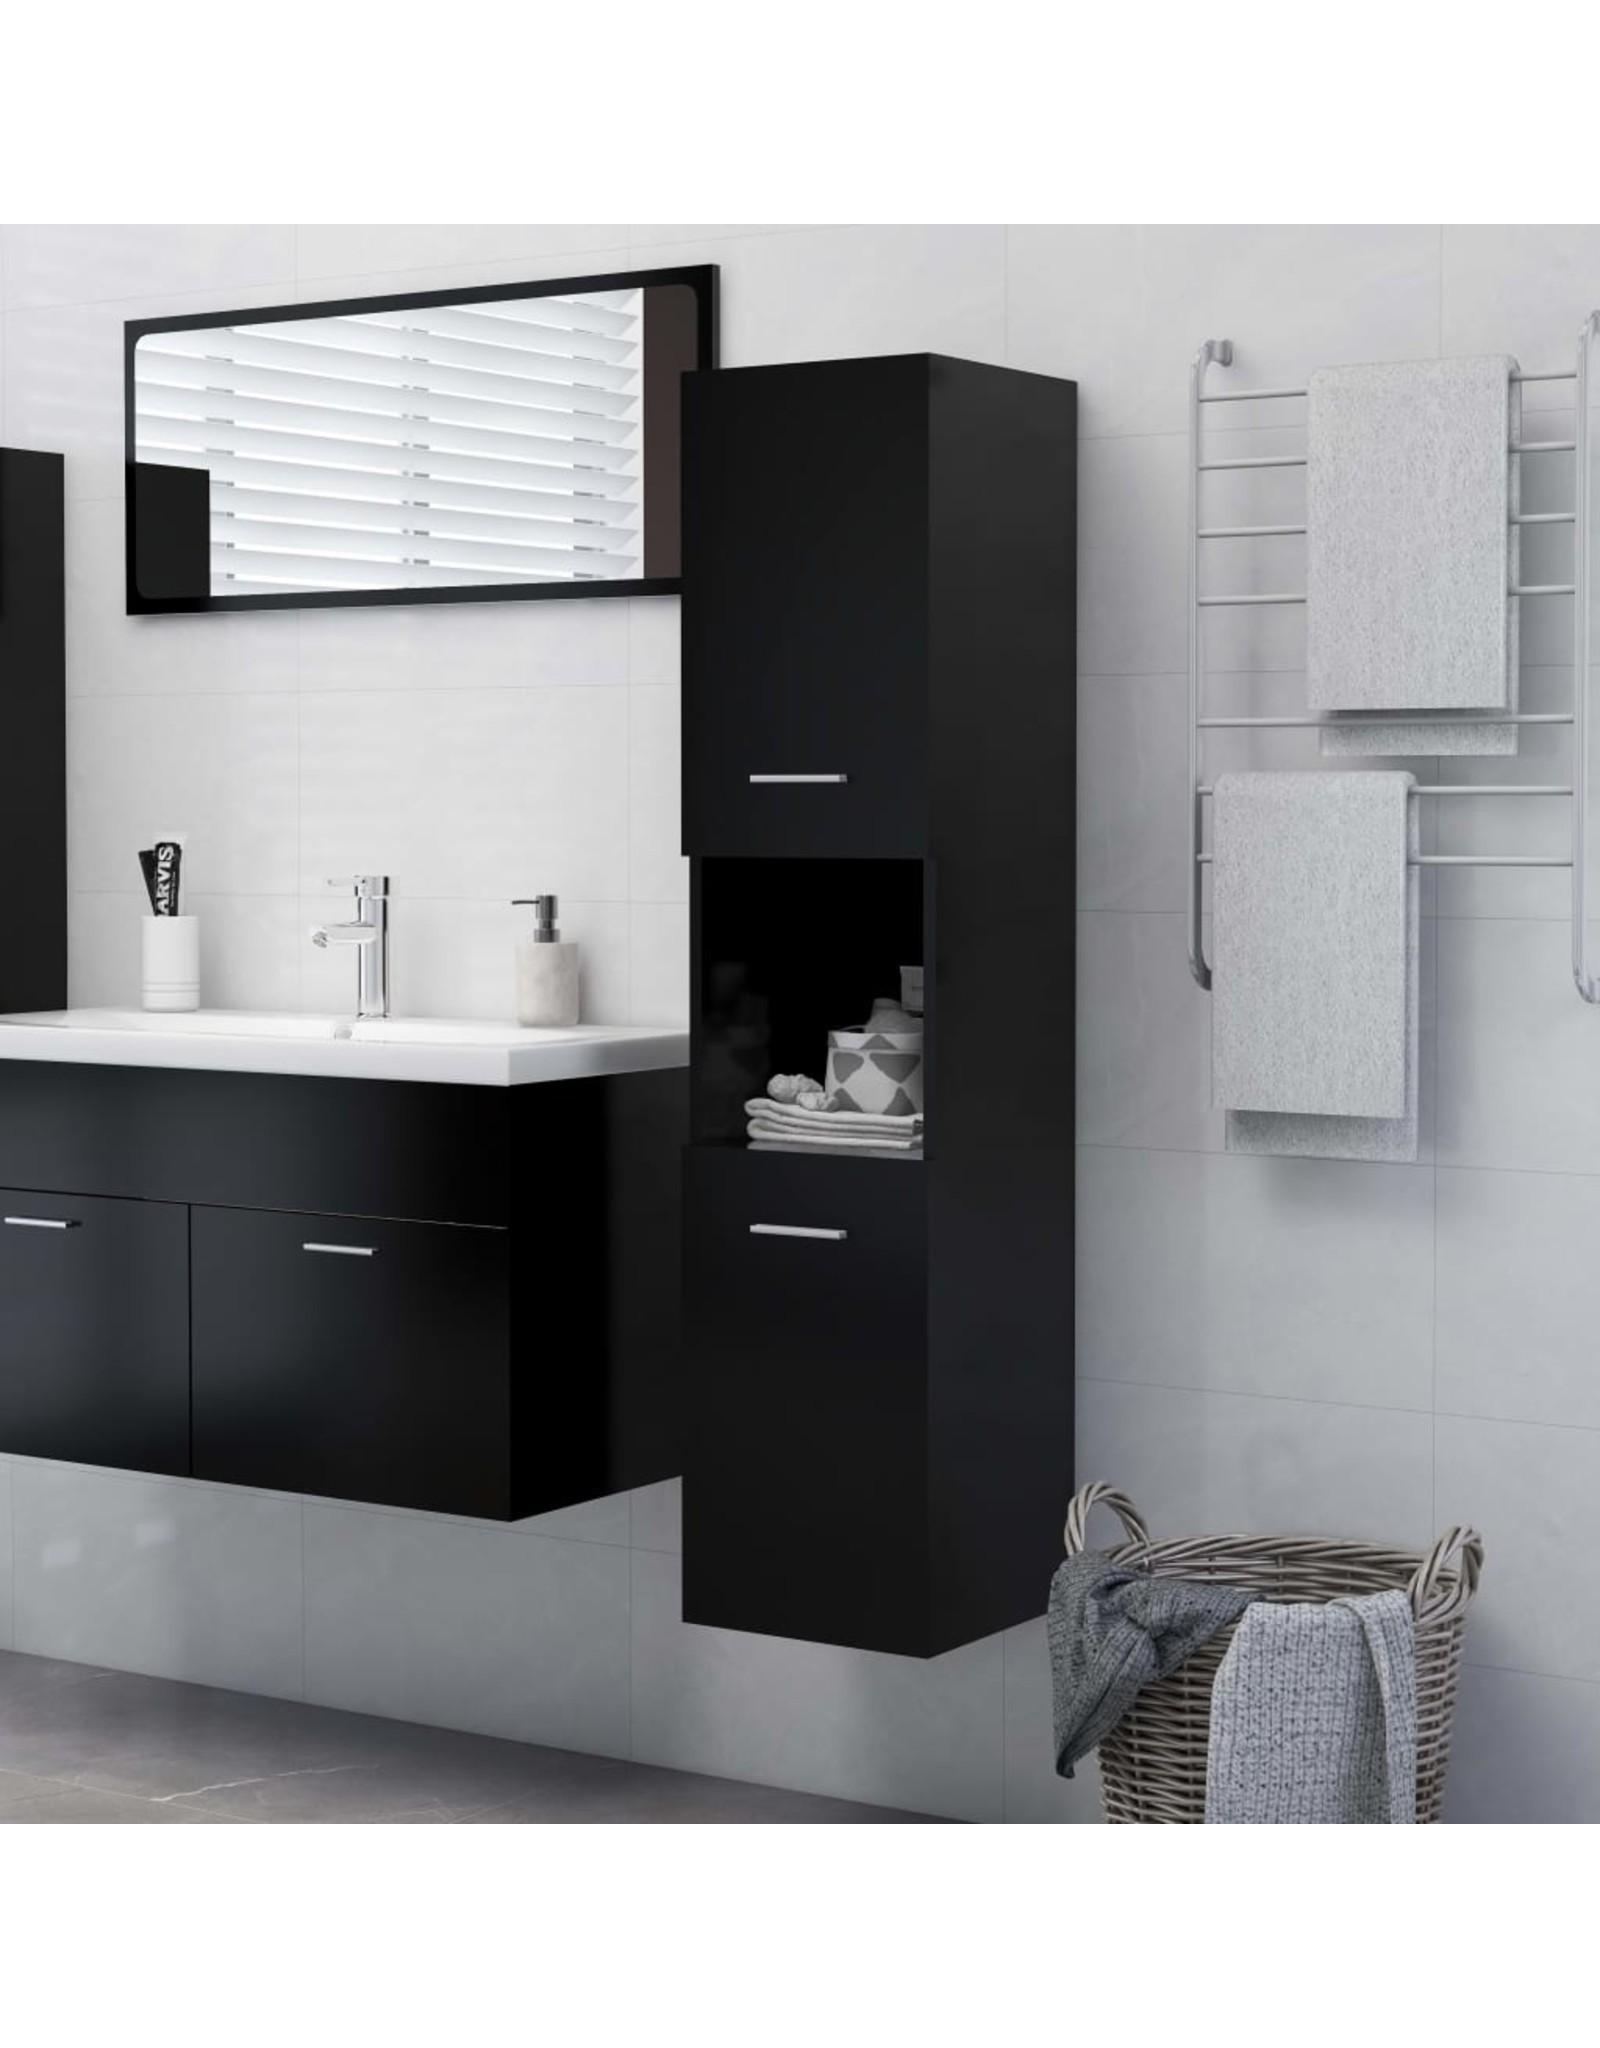 Badkamerkast 30x30x130 cm spaanplaat zwart